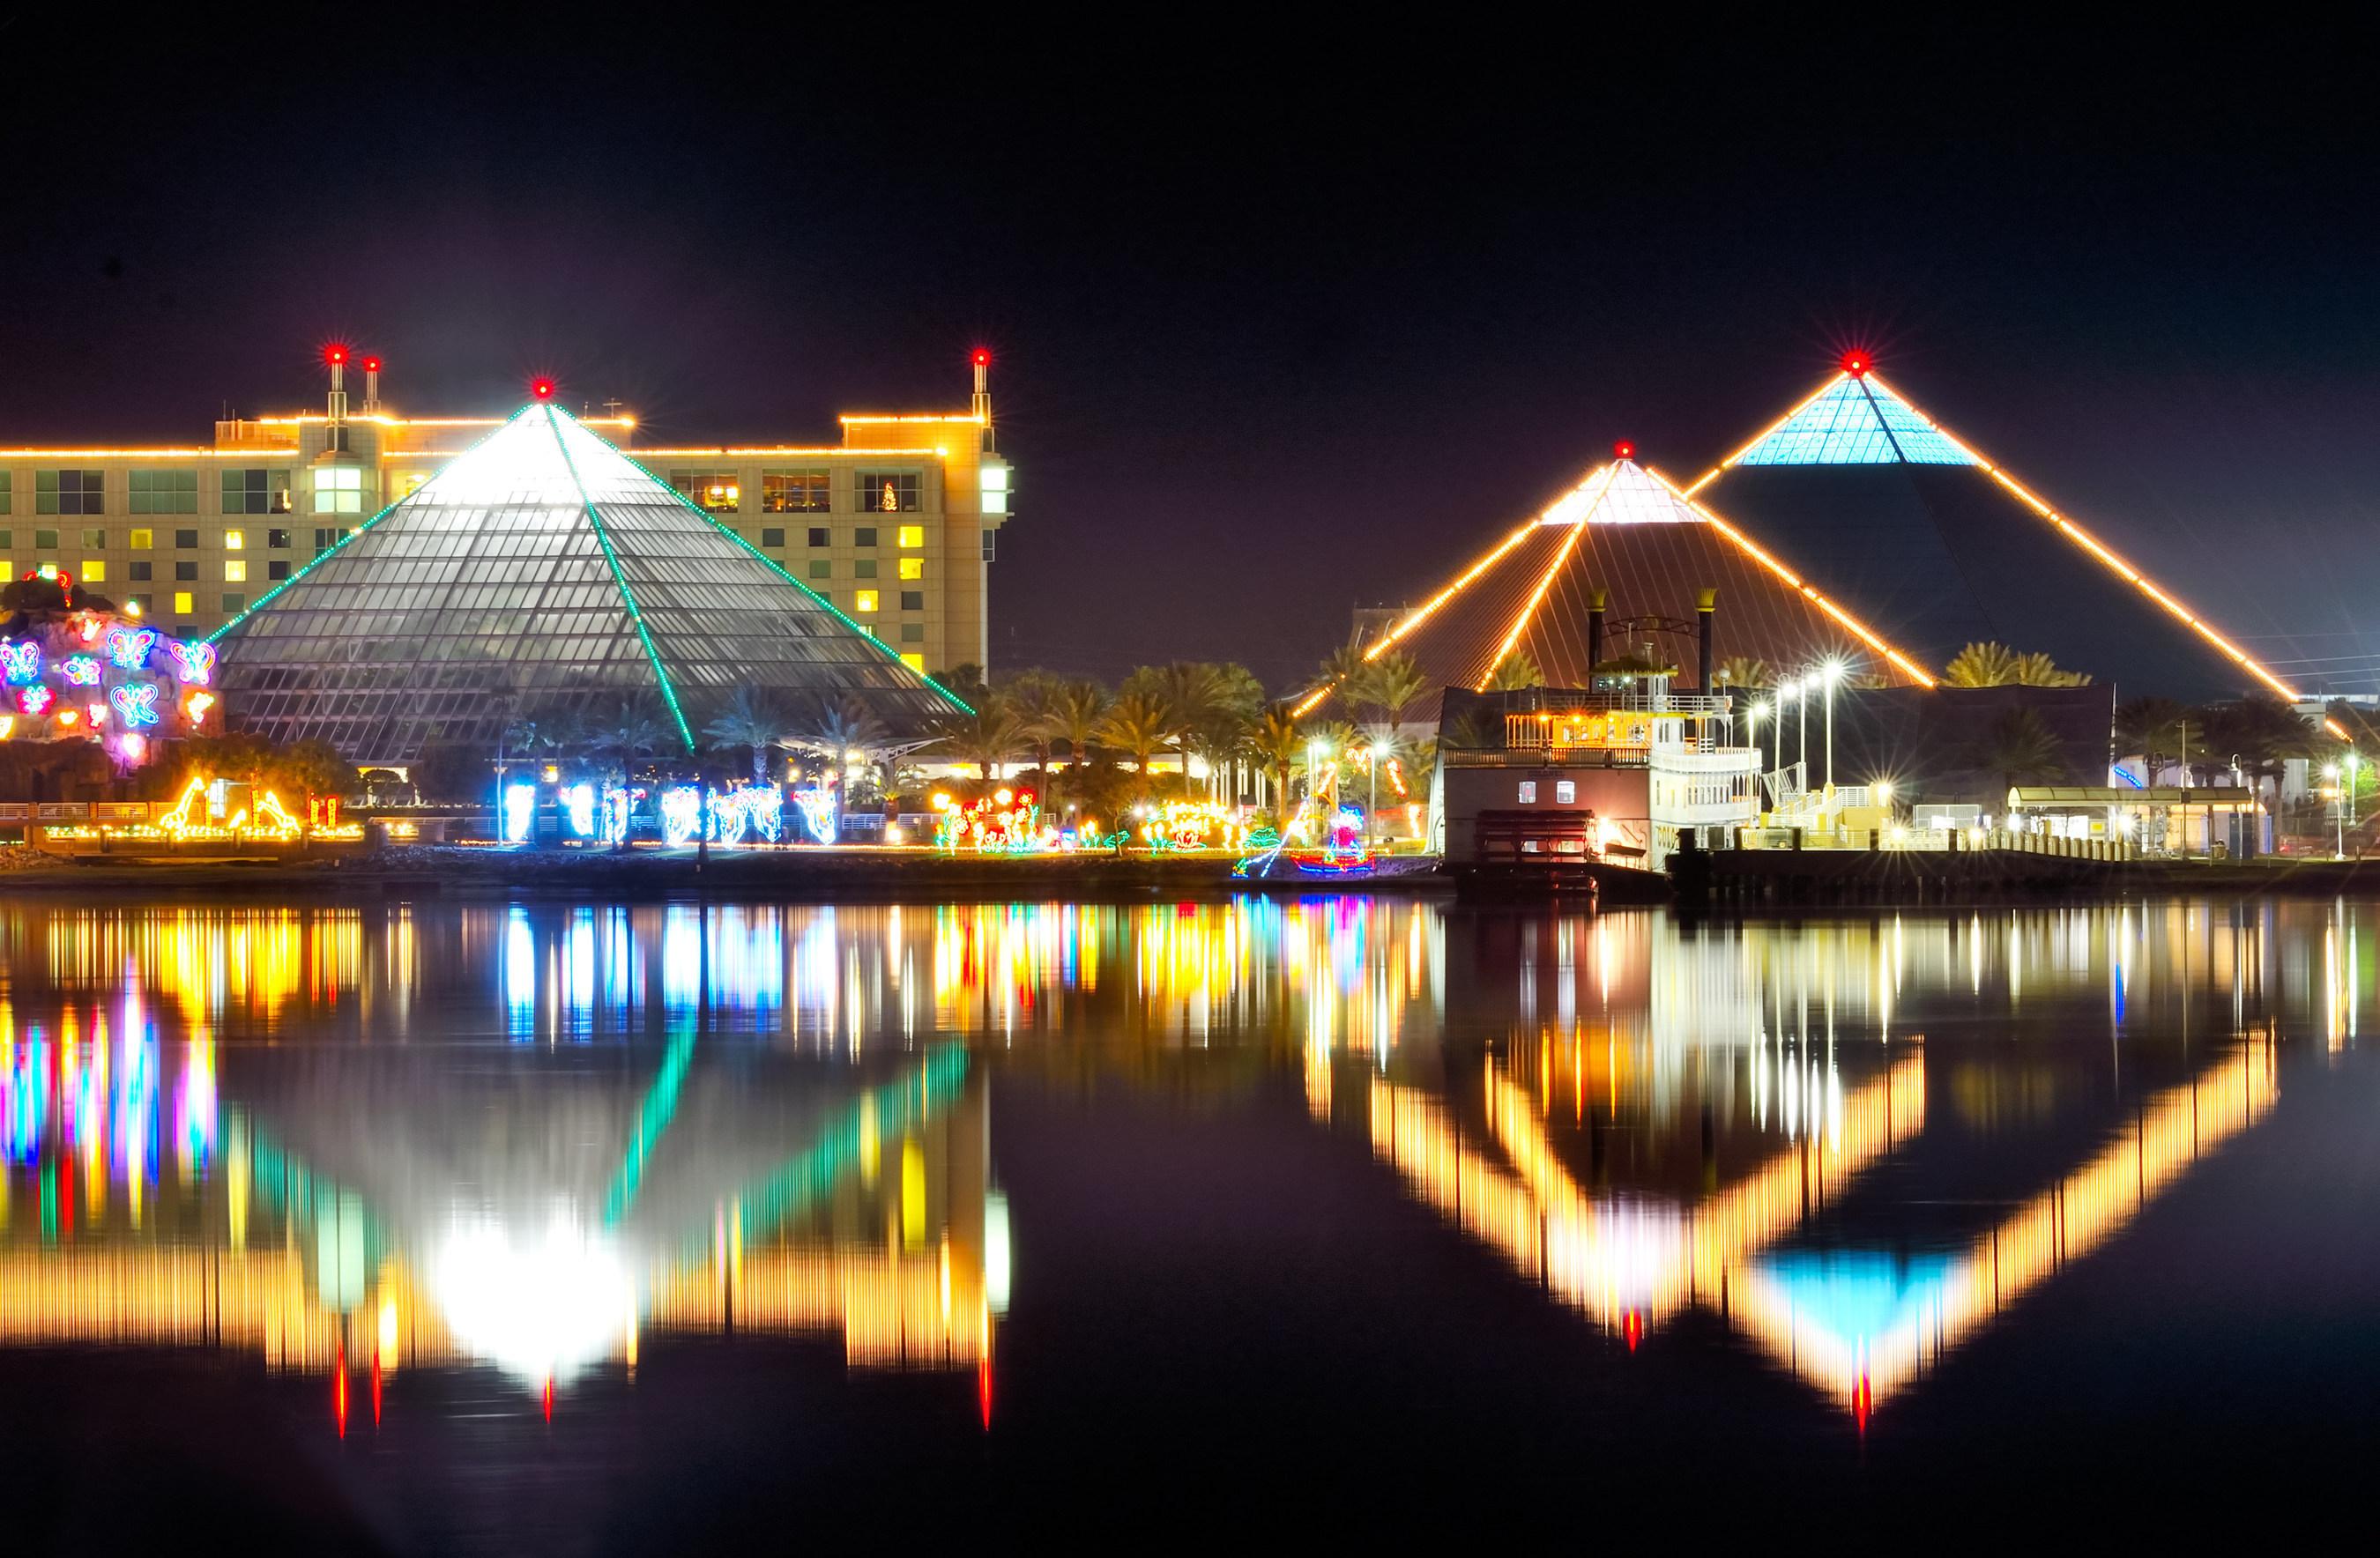 Festival of Lights opens at Moody Gardens in Galveston, TX on Saturday, November 12